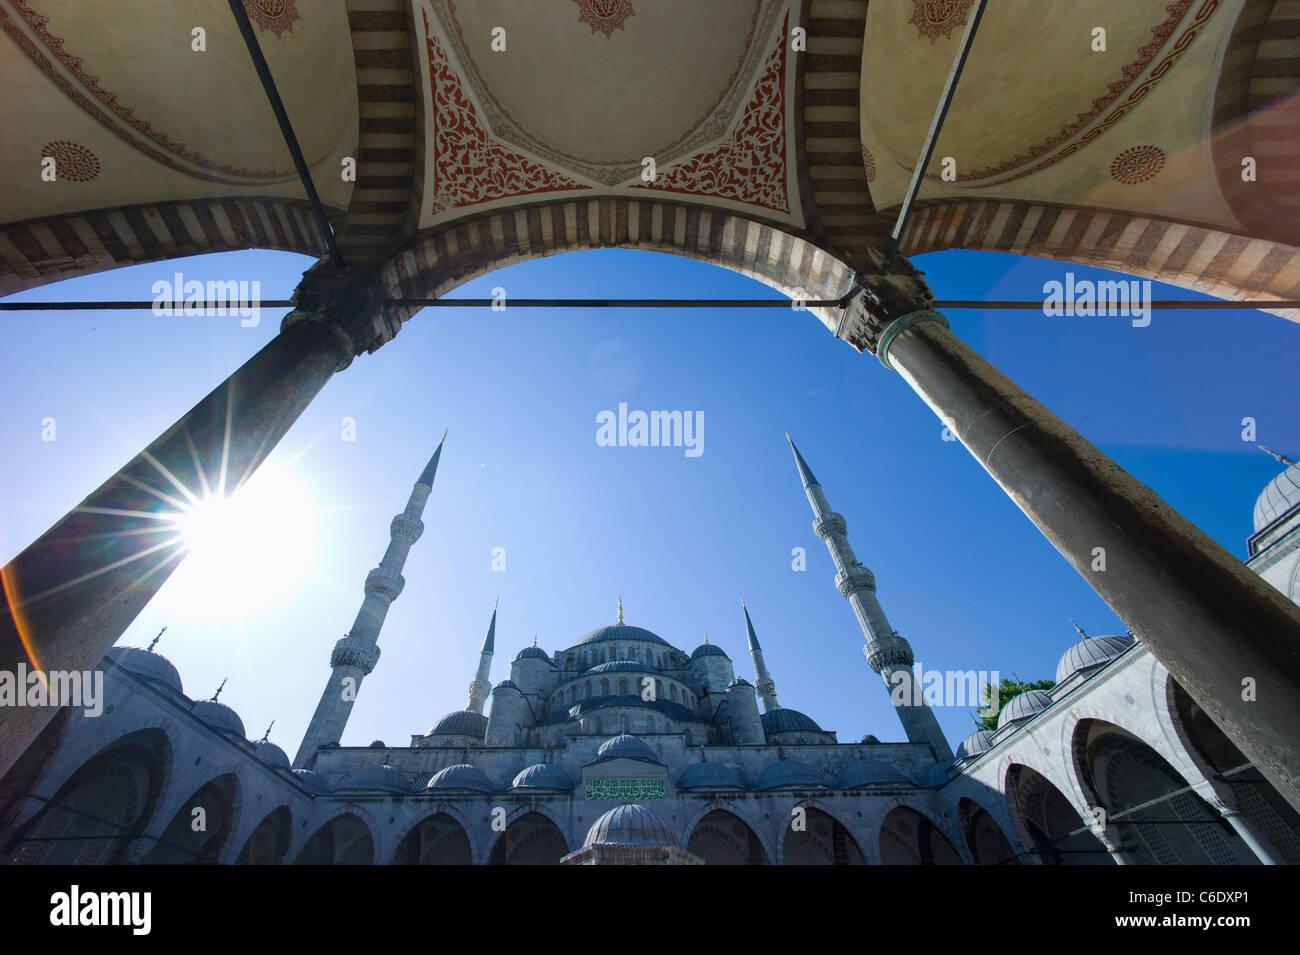 Turquía, Estambul, la Mezquita Azul Imagen De Stock